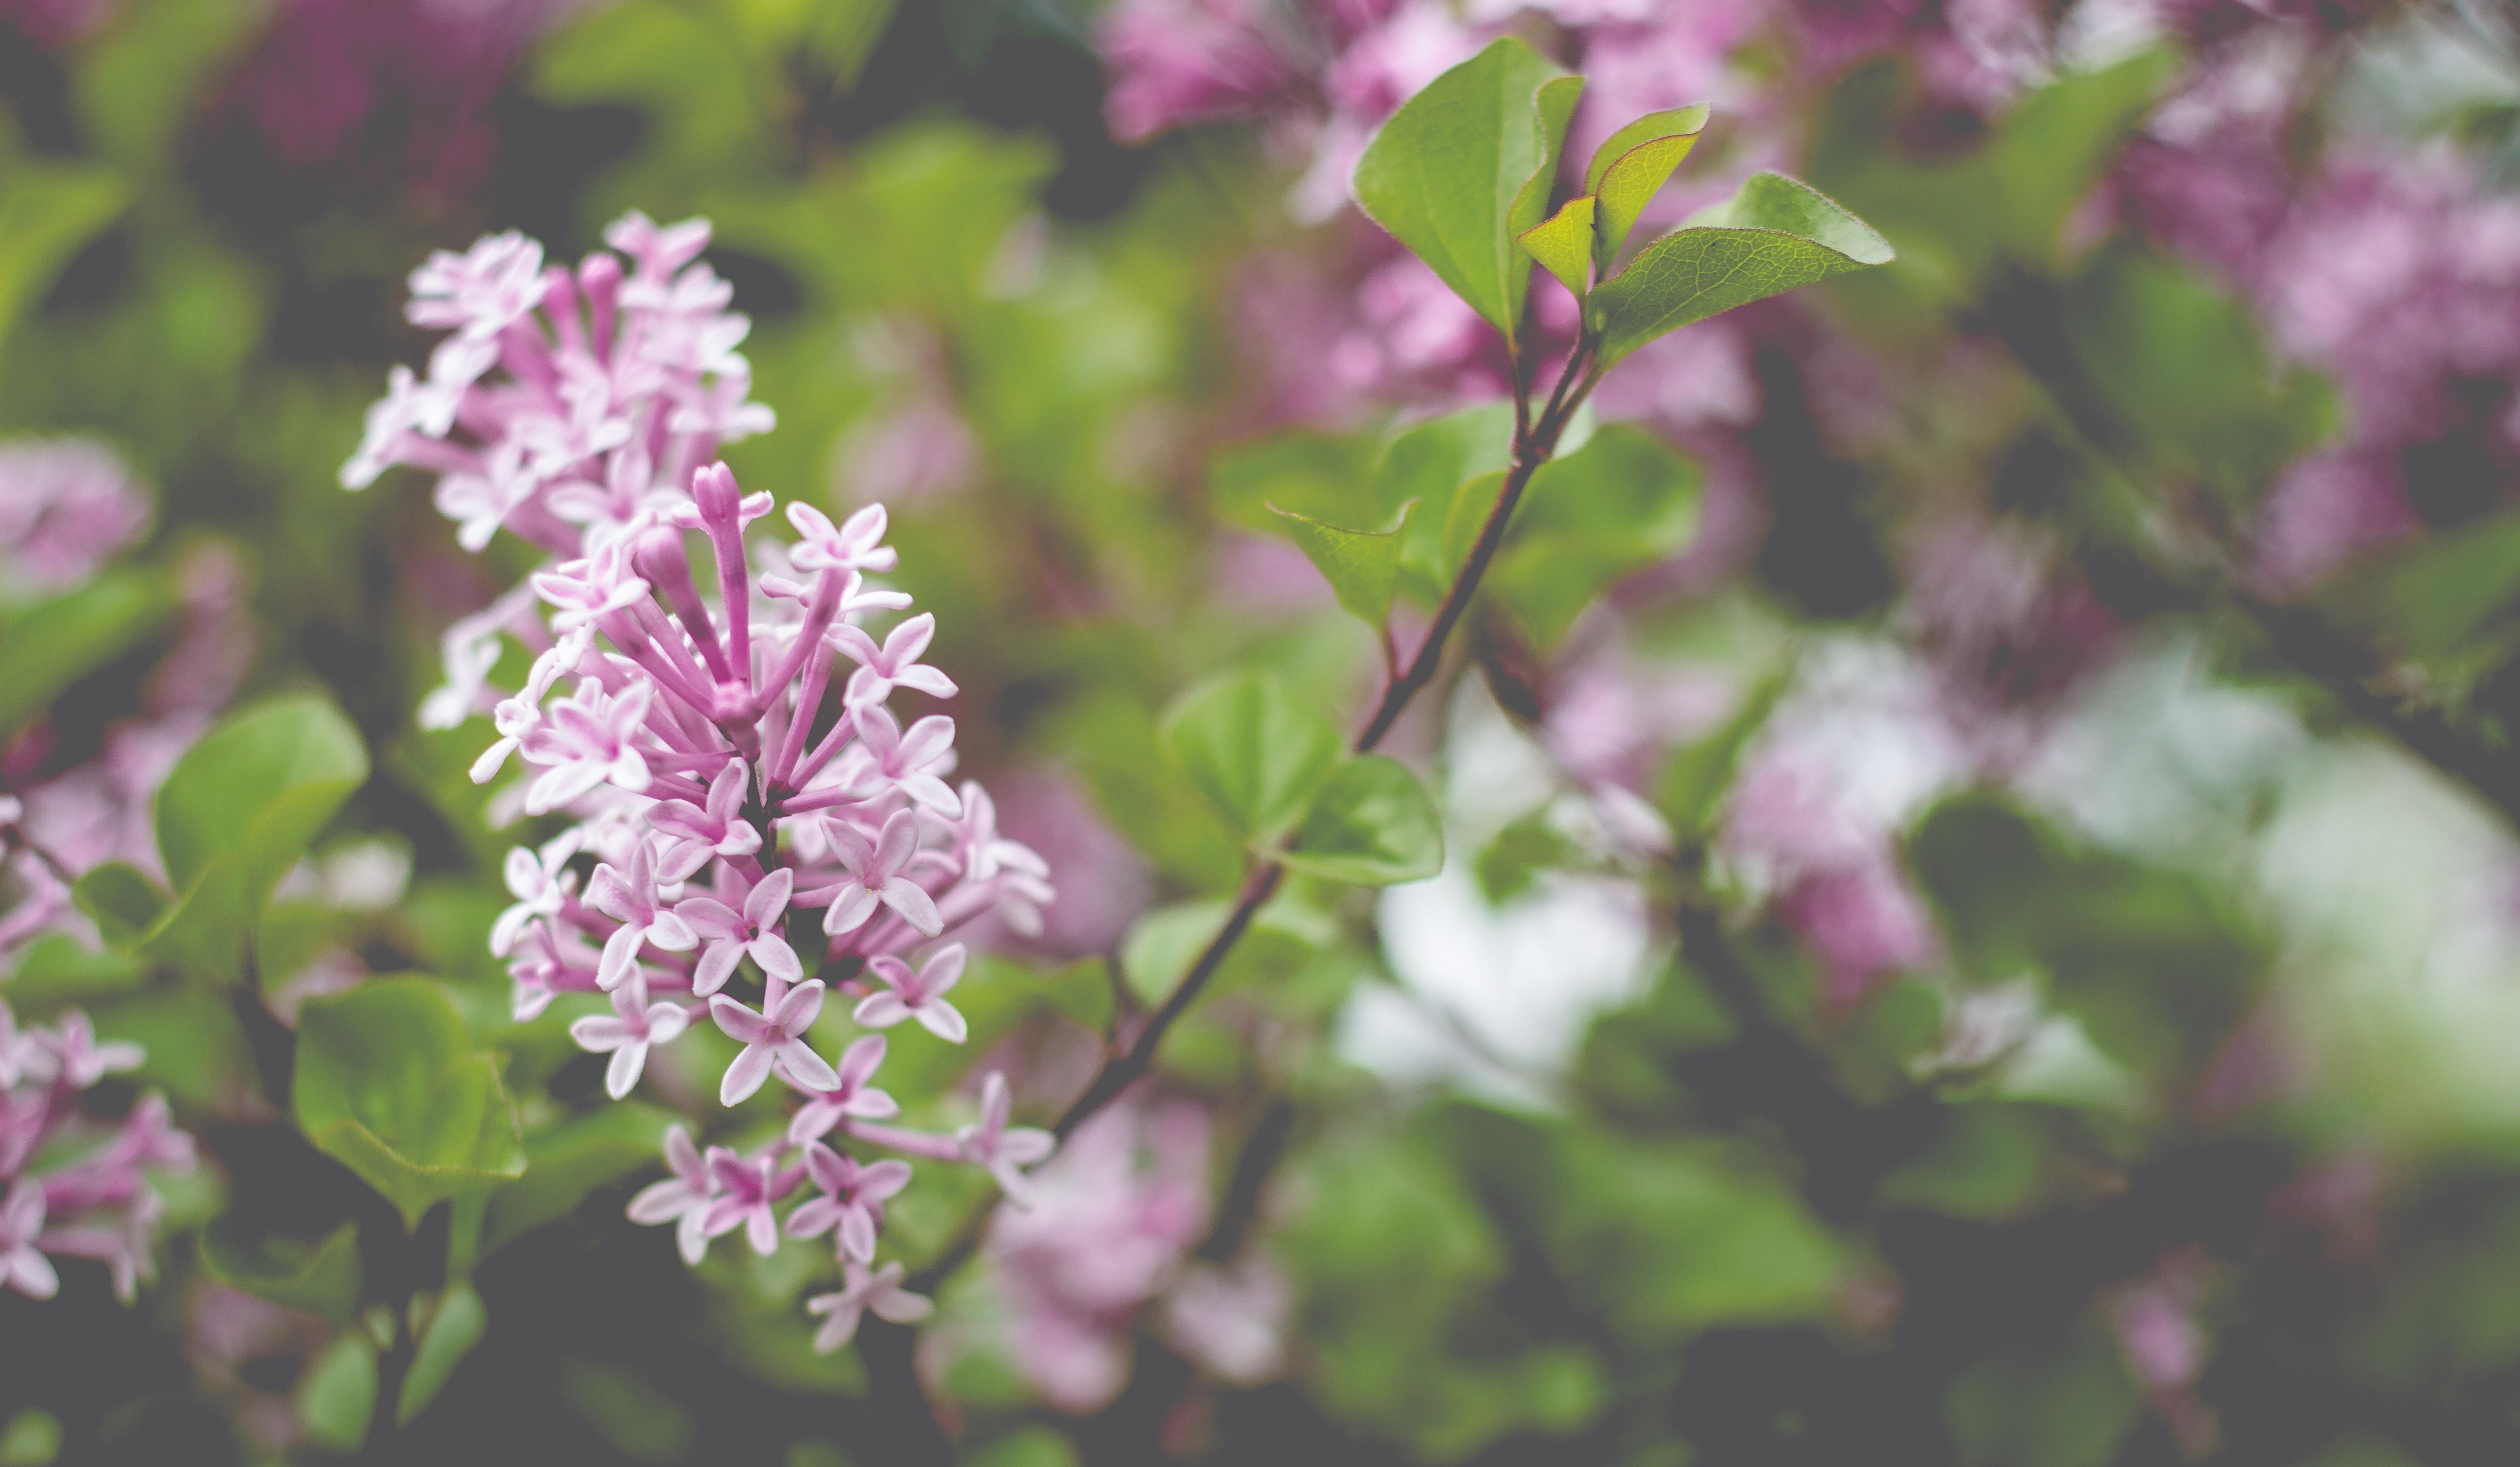 natureza ramo flor plantar folha flor roxa flor primavera erva botnica jardim flora flores silvestres arbusto